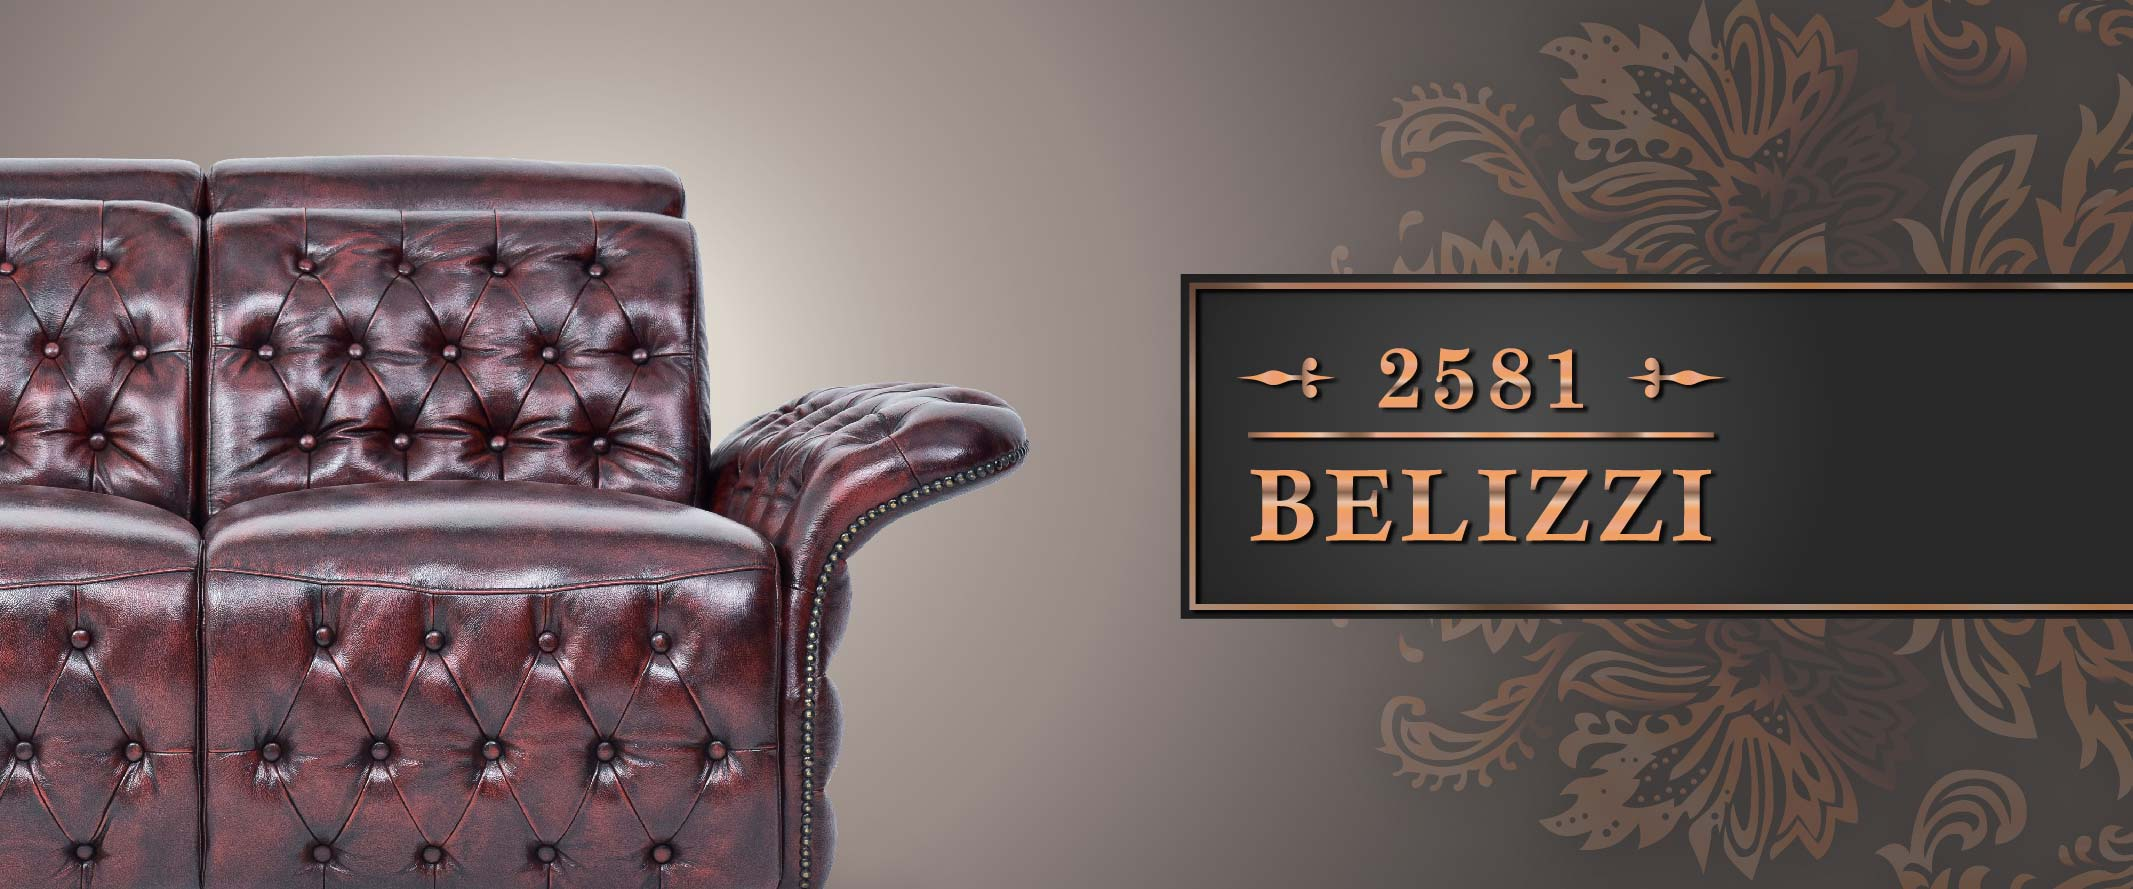 product-2581-belizzi